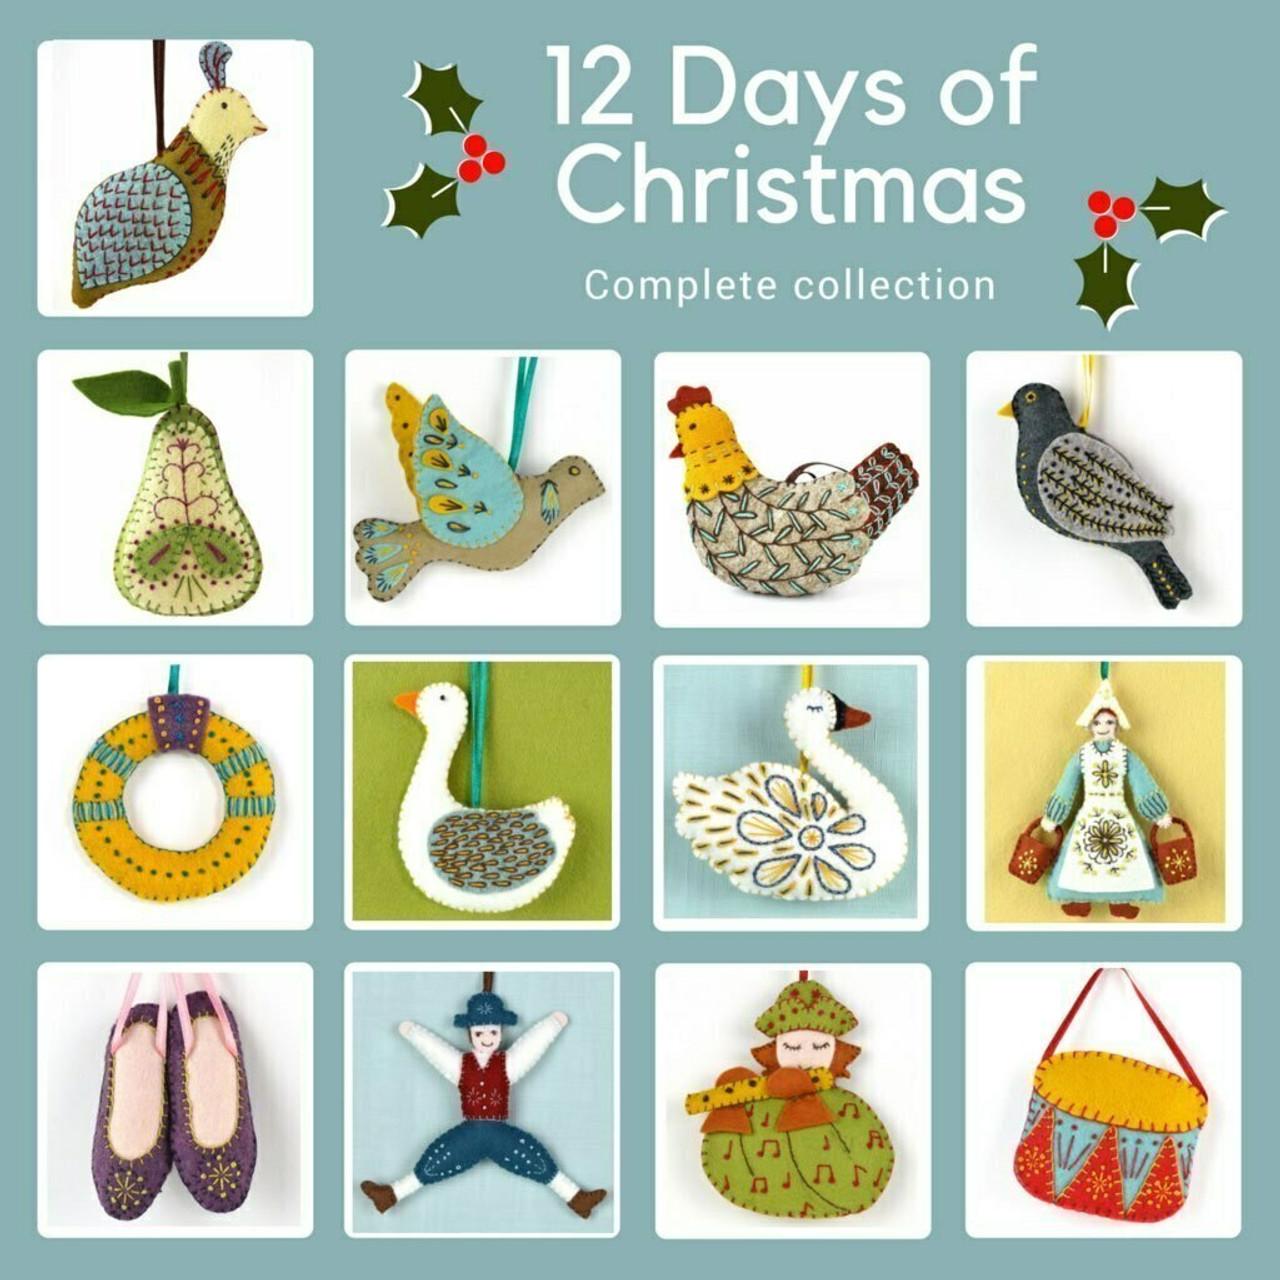 12 Days of Christmas Felt Club Kit